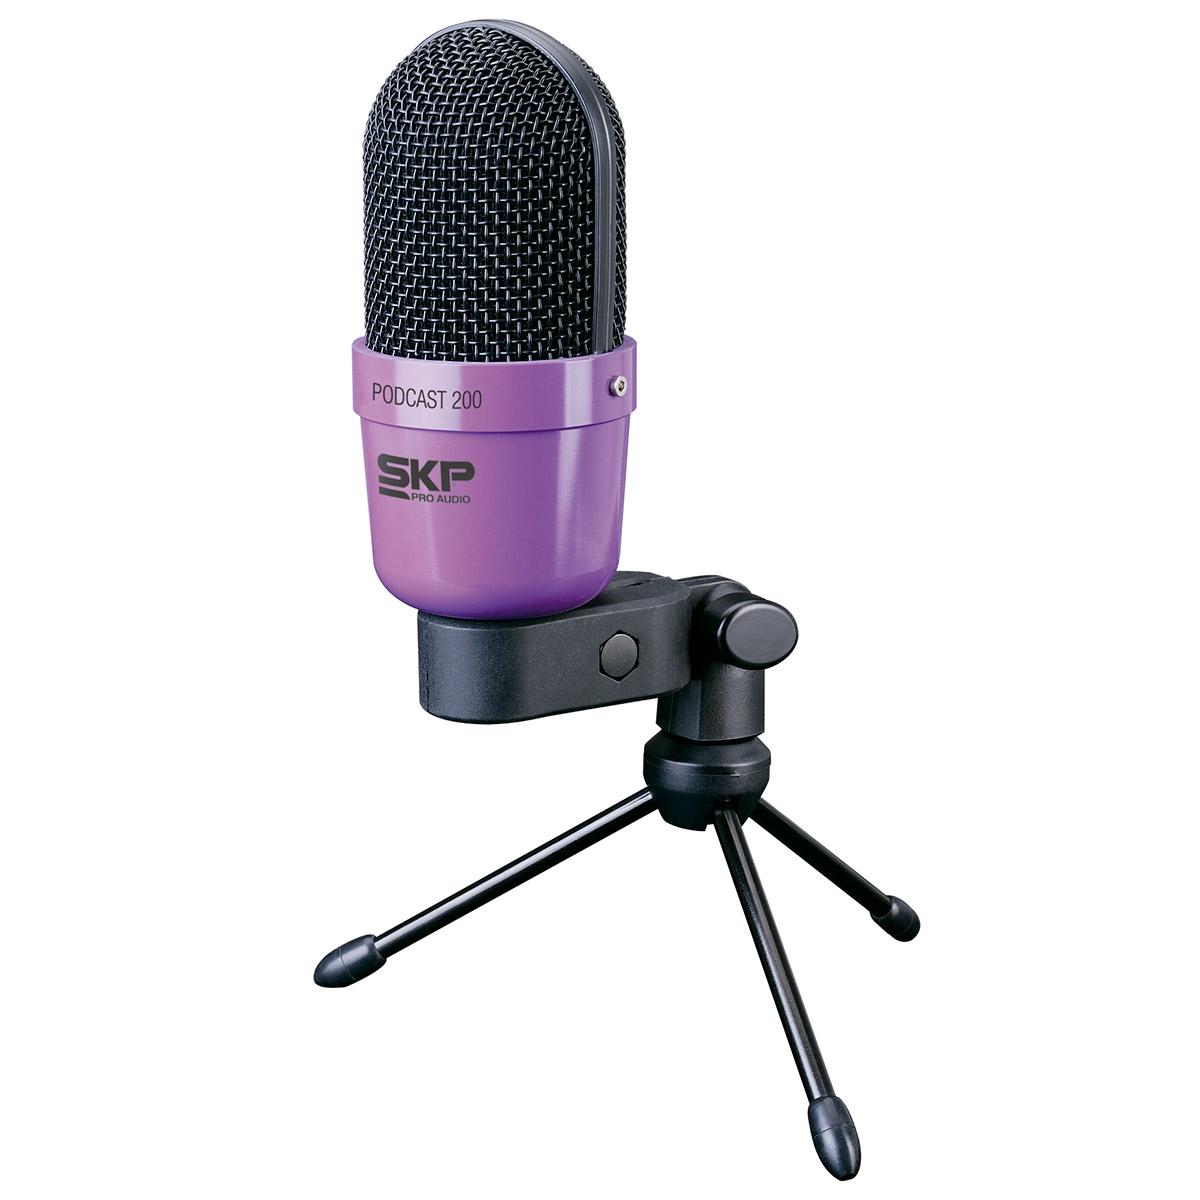 Podcast200 - Microfone c/ Fio p/ Estúdio P2 Podcast 200 - SKP